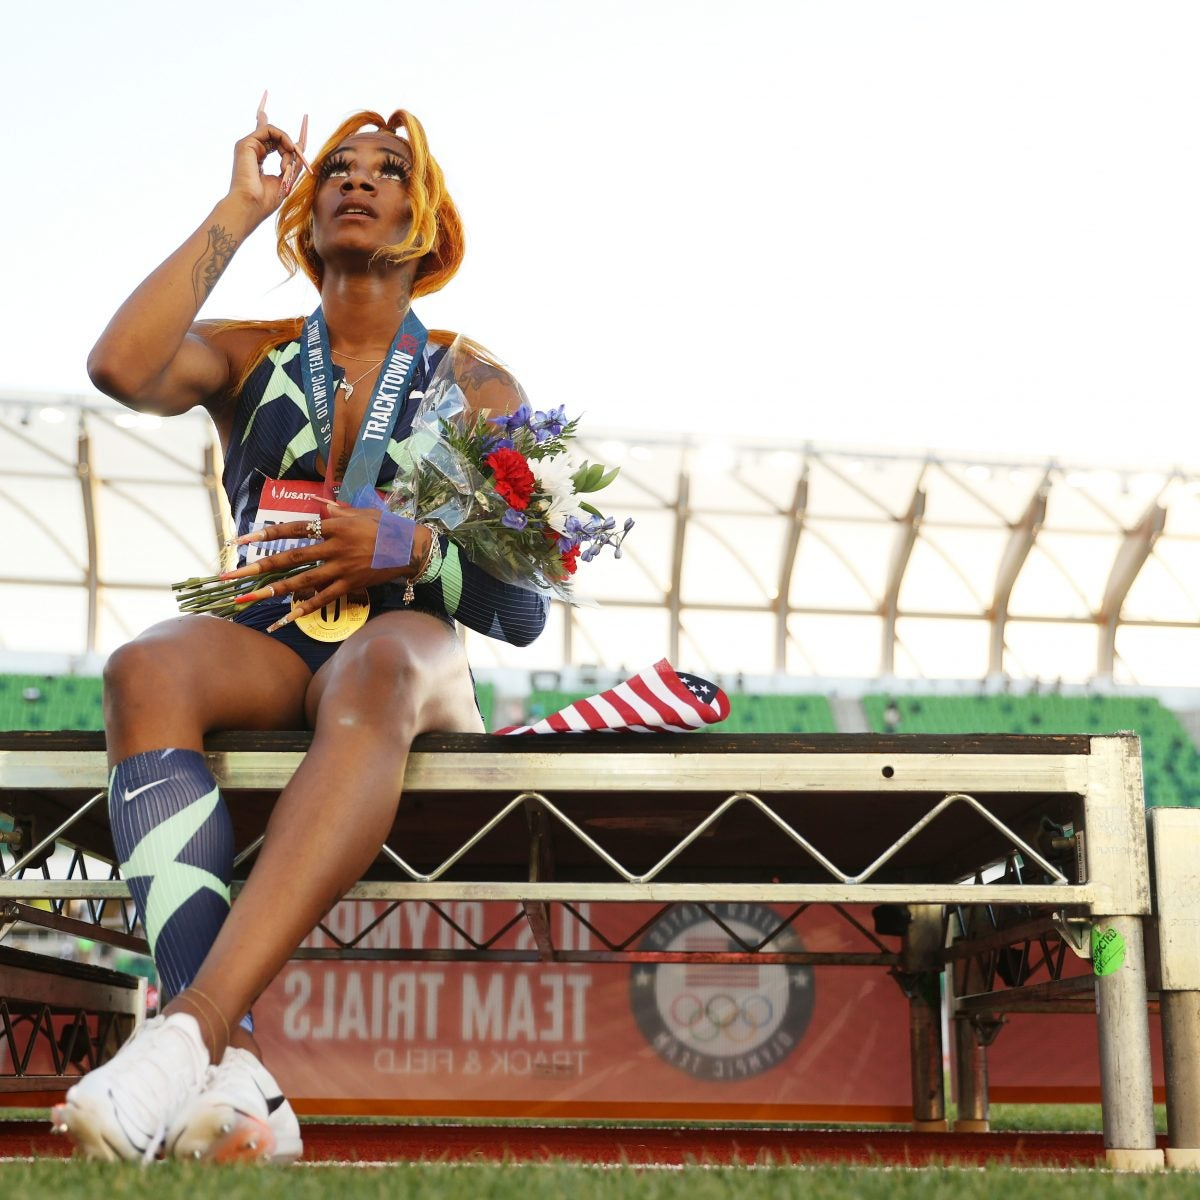 Sprinter Sha'Carri Richardson Won't Compete at 2021 Tokyo Olympics